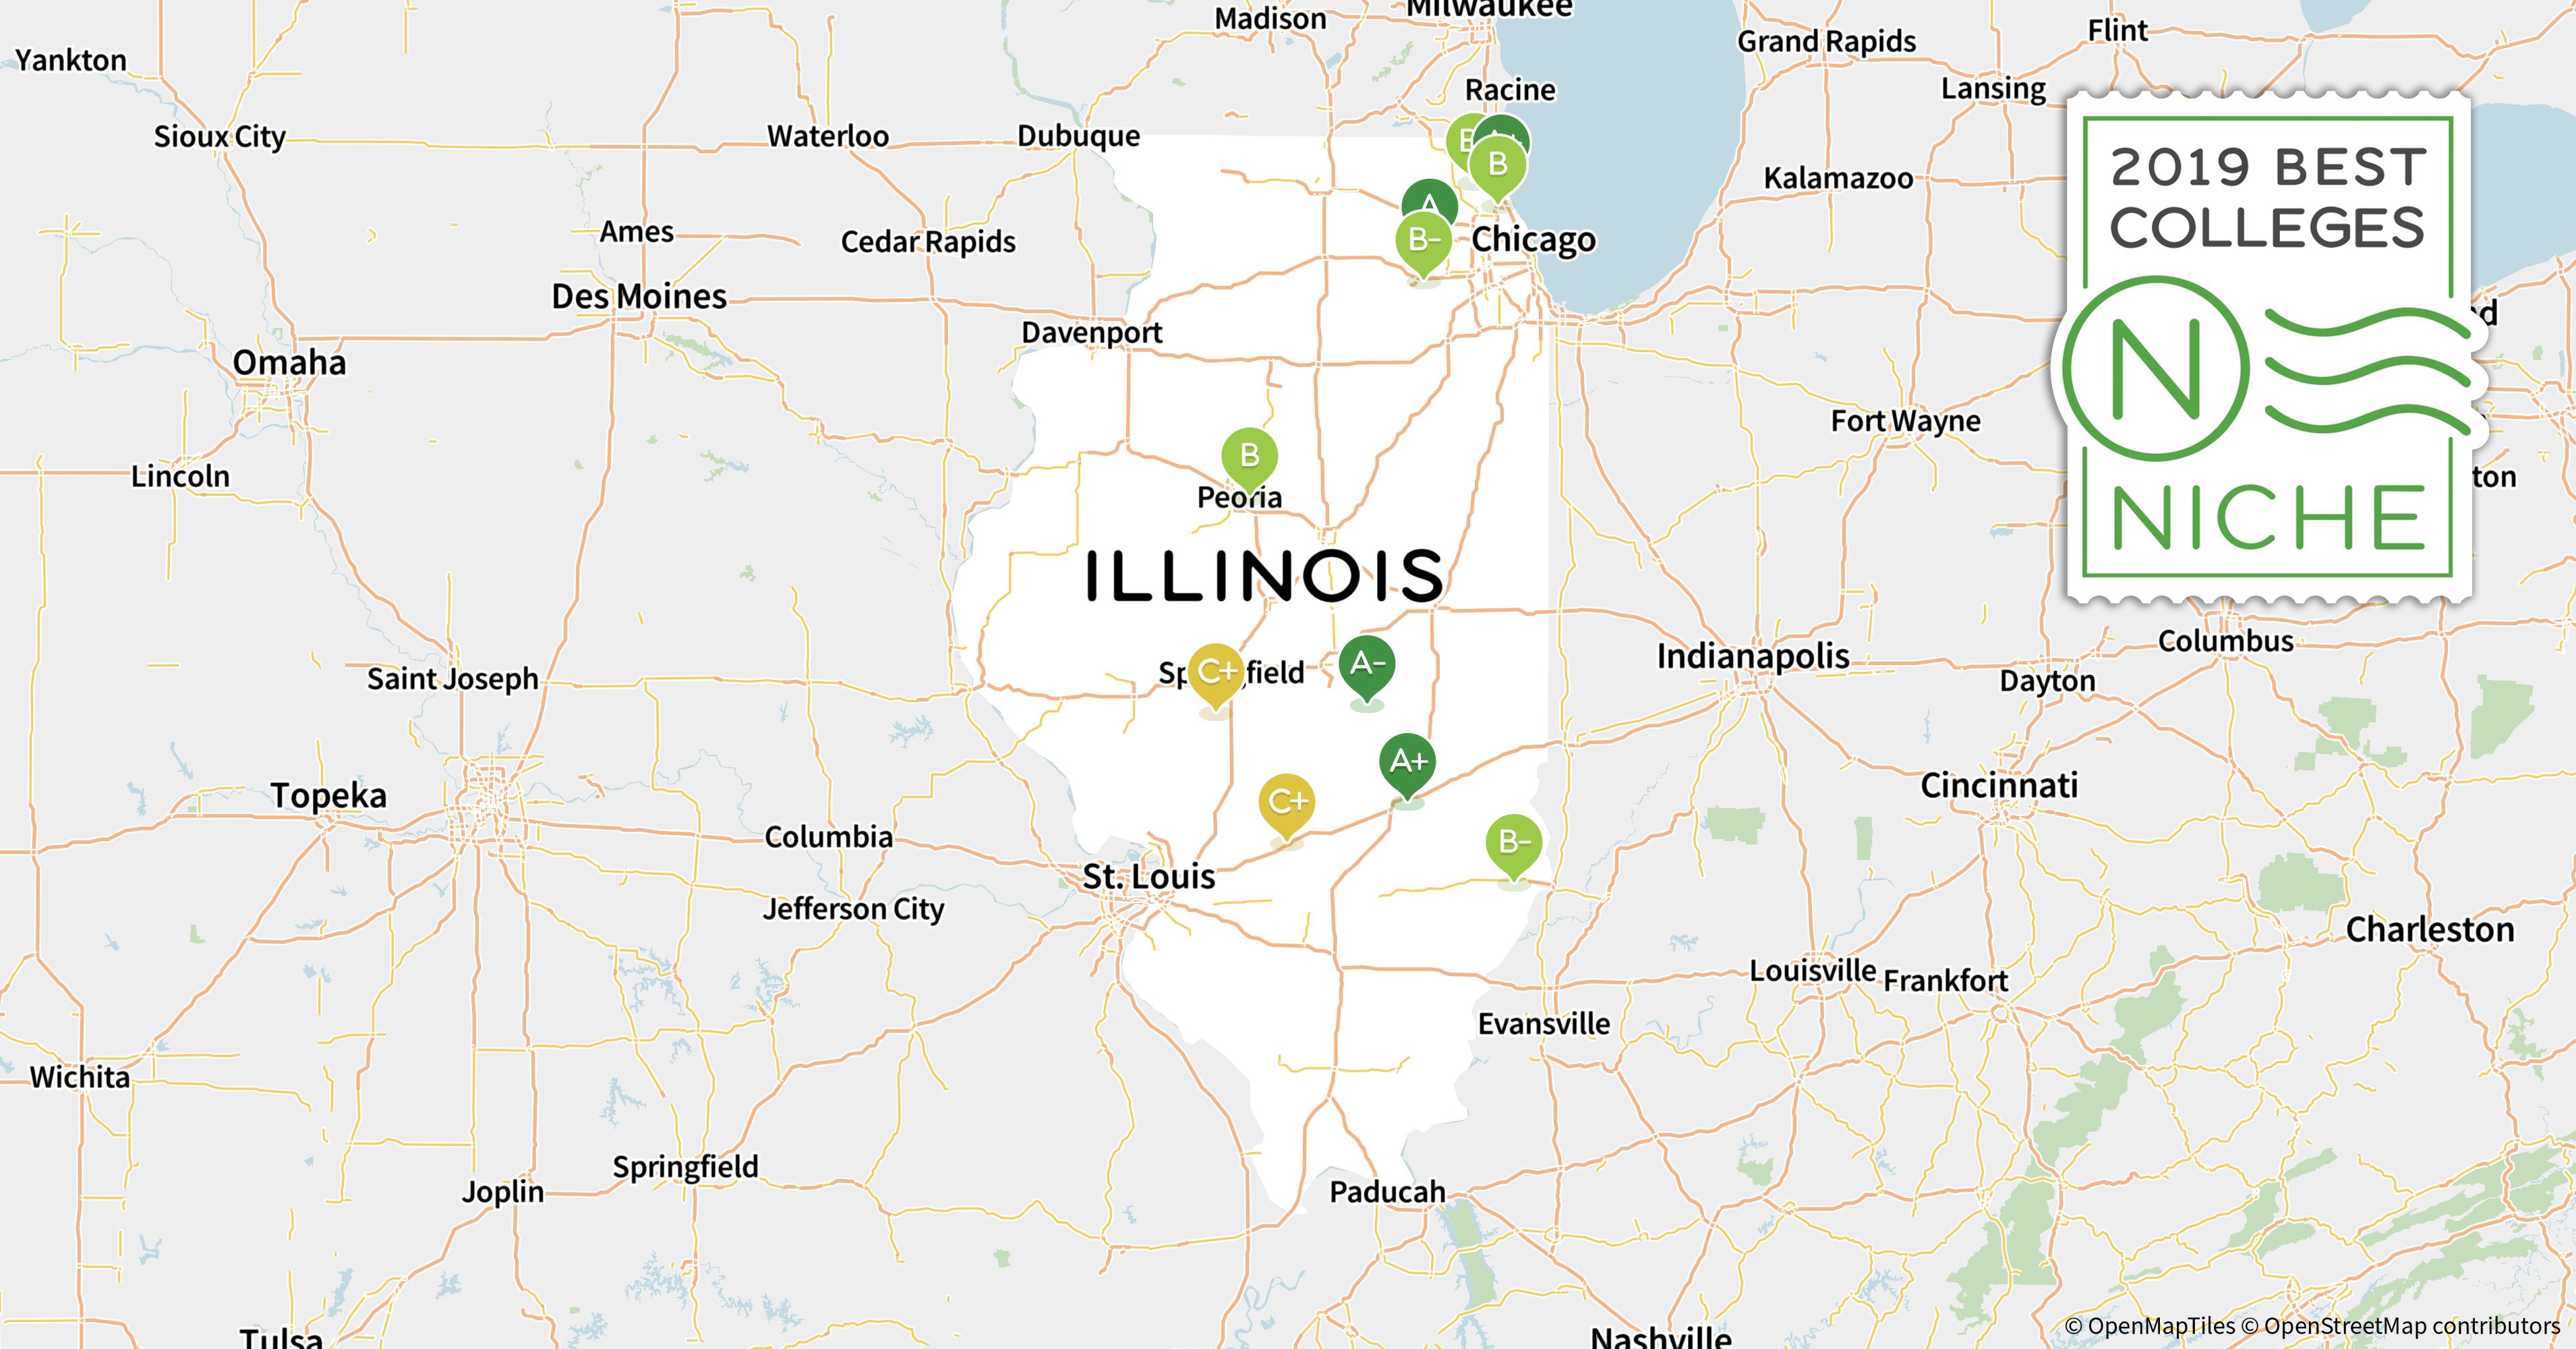 2019 Top Public Administration Graduate Programs in Illinois